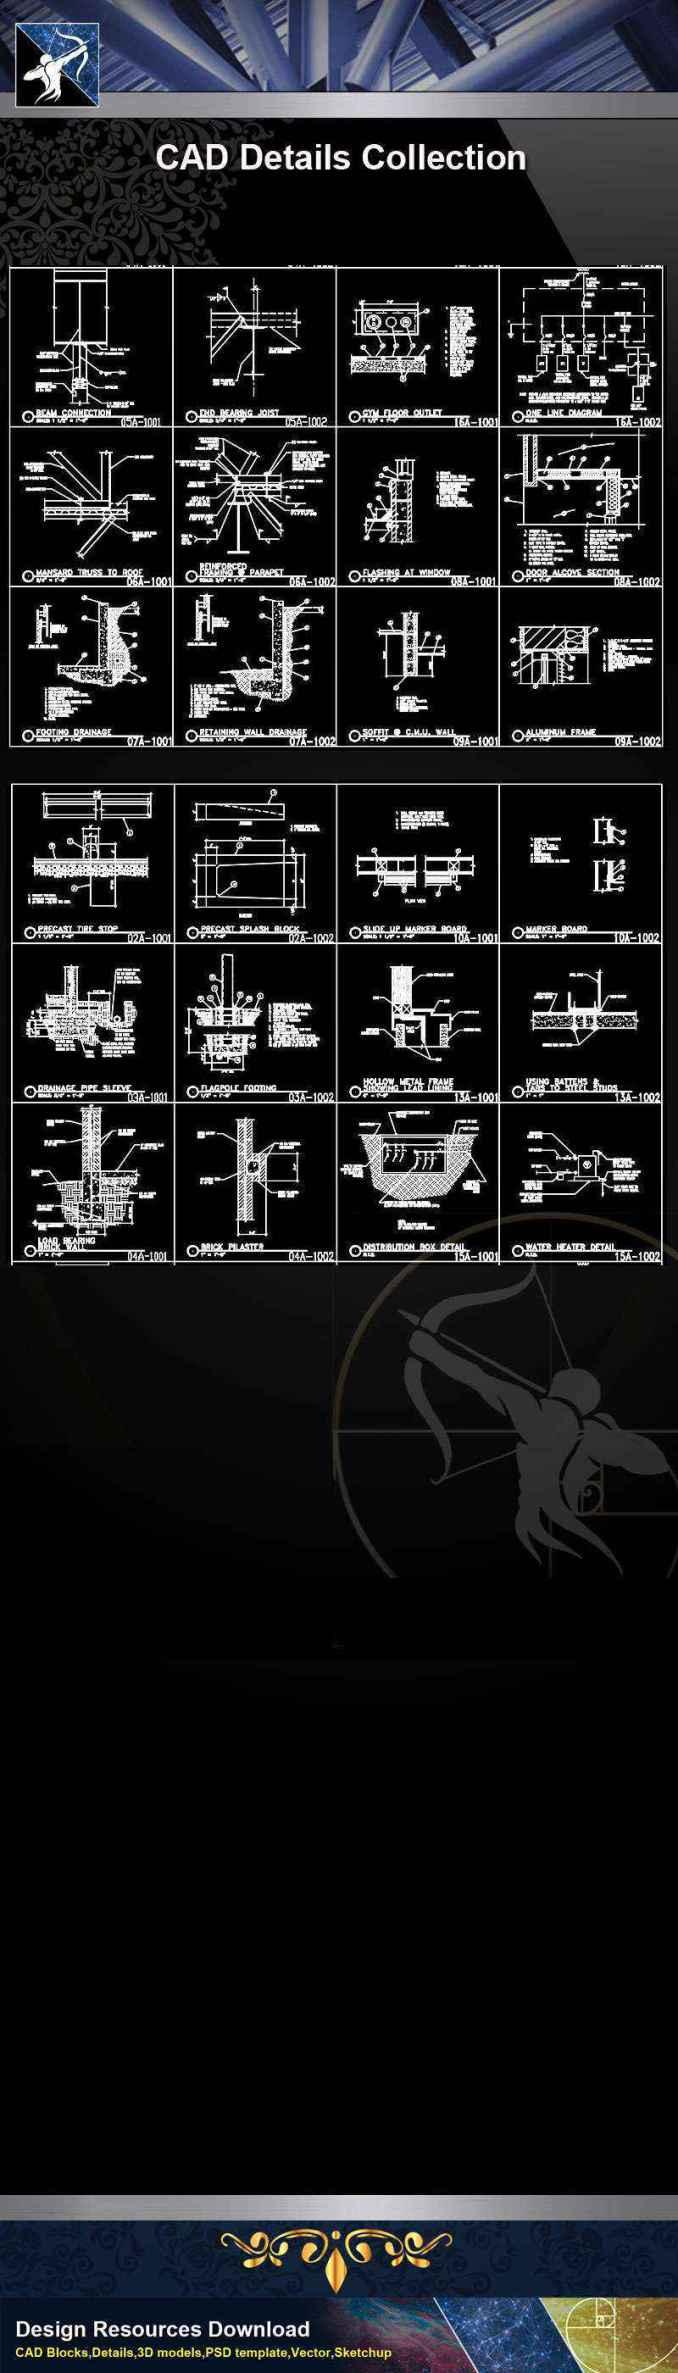 【Architecture CAD Details Collections】CAD Details Collection